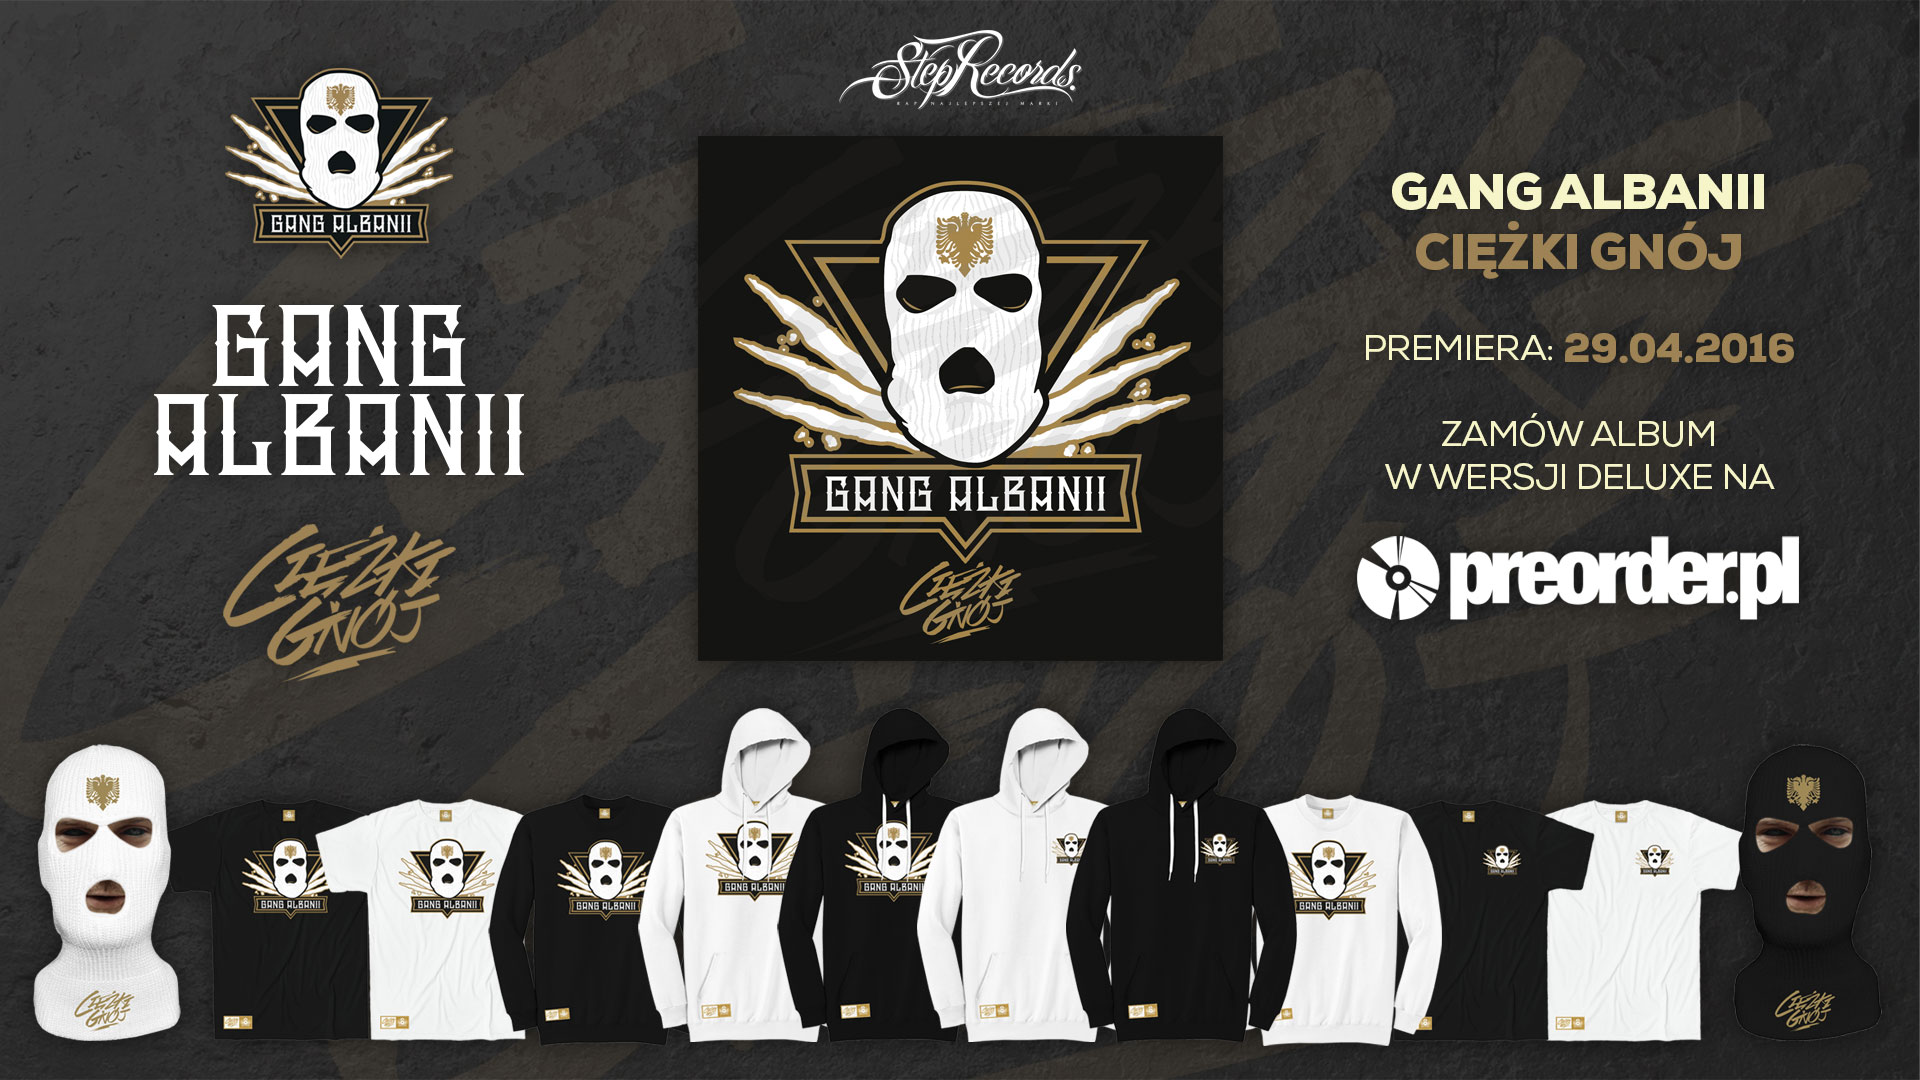 8e71e82c3551 Preorder albumu Gang Albanii - Ciężki Gnój!